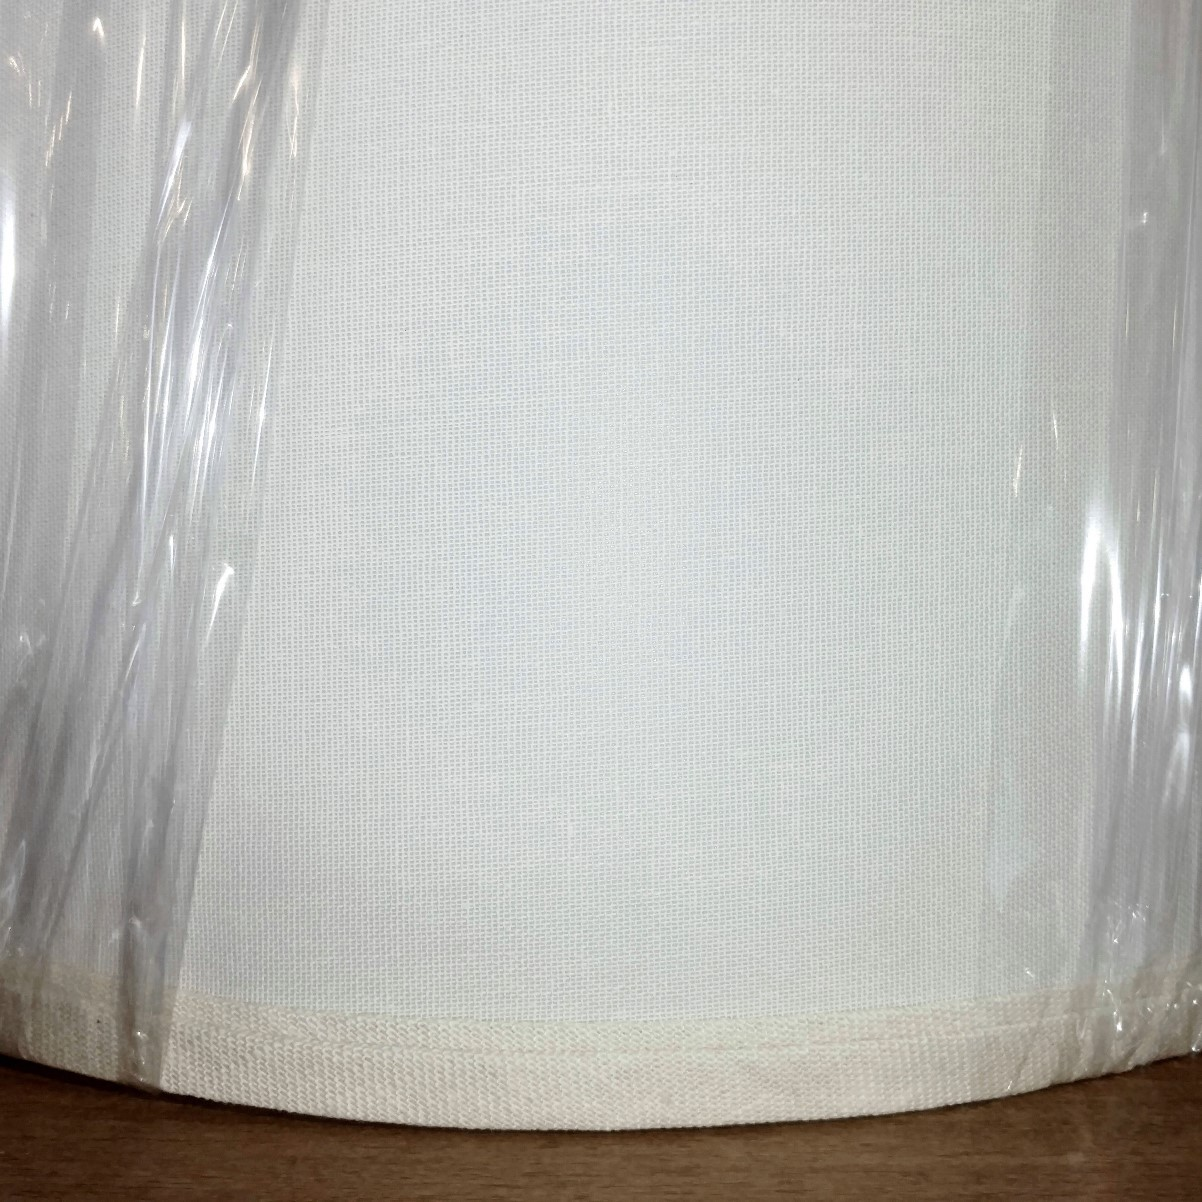 Linen Lampshade Closeup